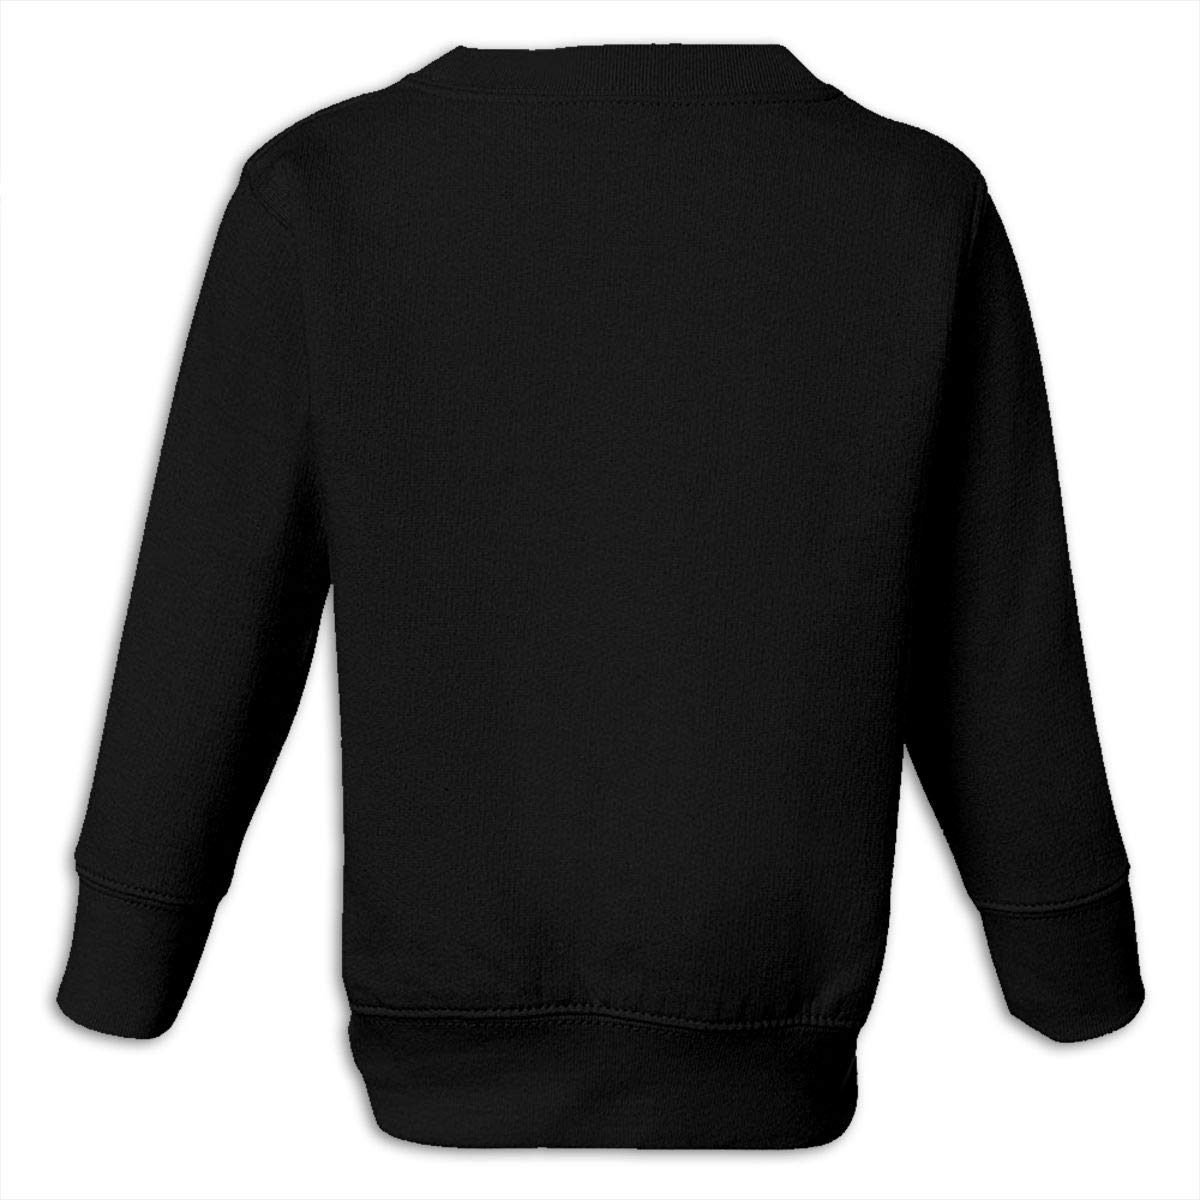 Yuliang BCS Colors Girl Personality Sweater Black